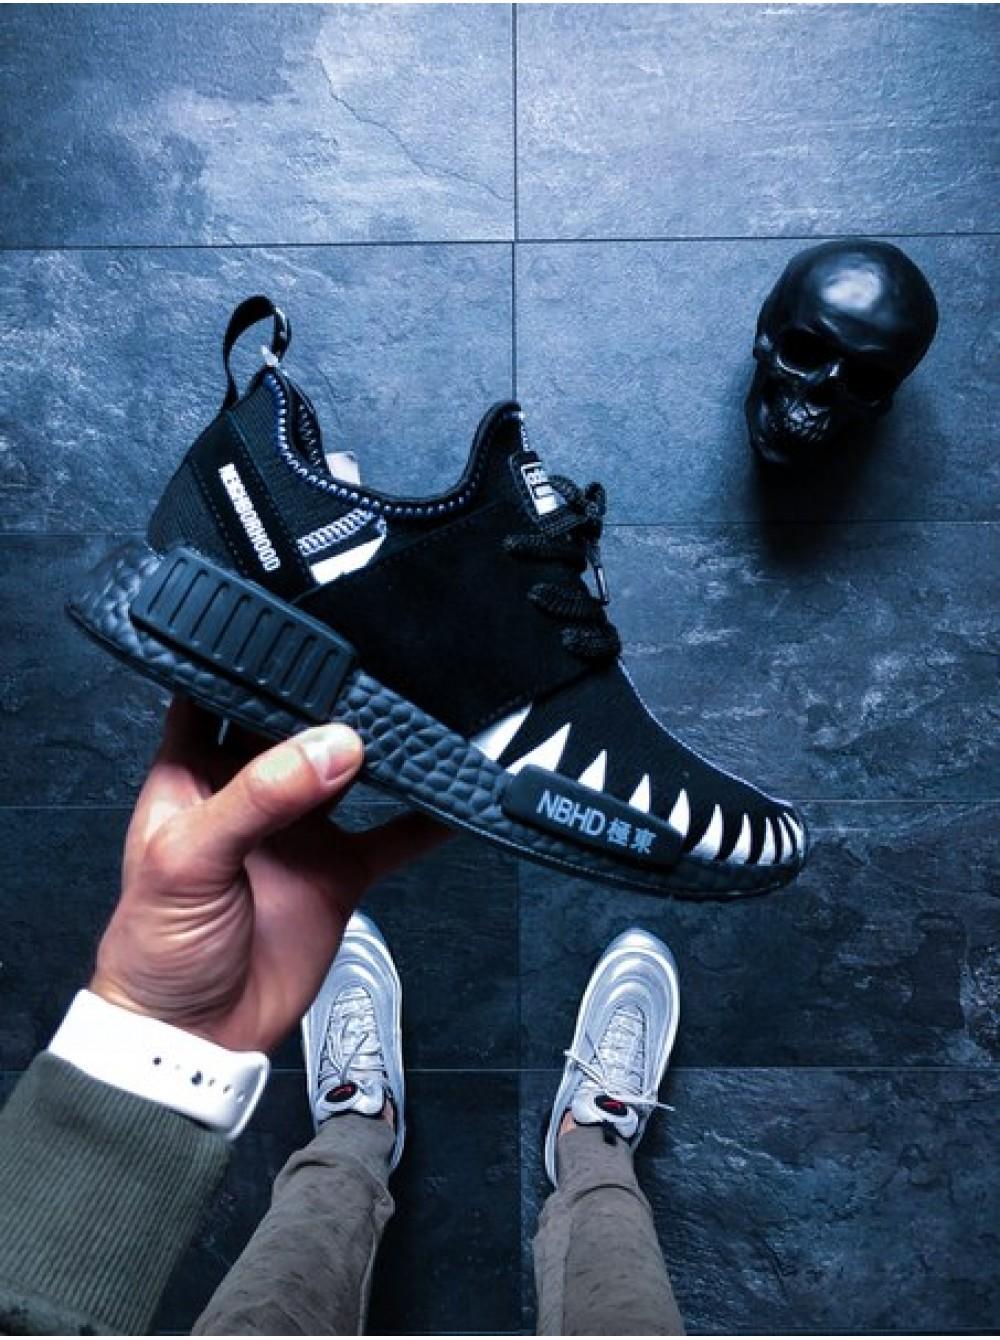 super popular c8386 95a21 Кроссовки adidas x Neighborhood NMD R1 PK (Core Black / Core Black / Ftwr  White)